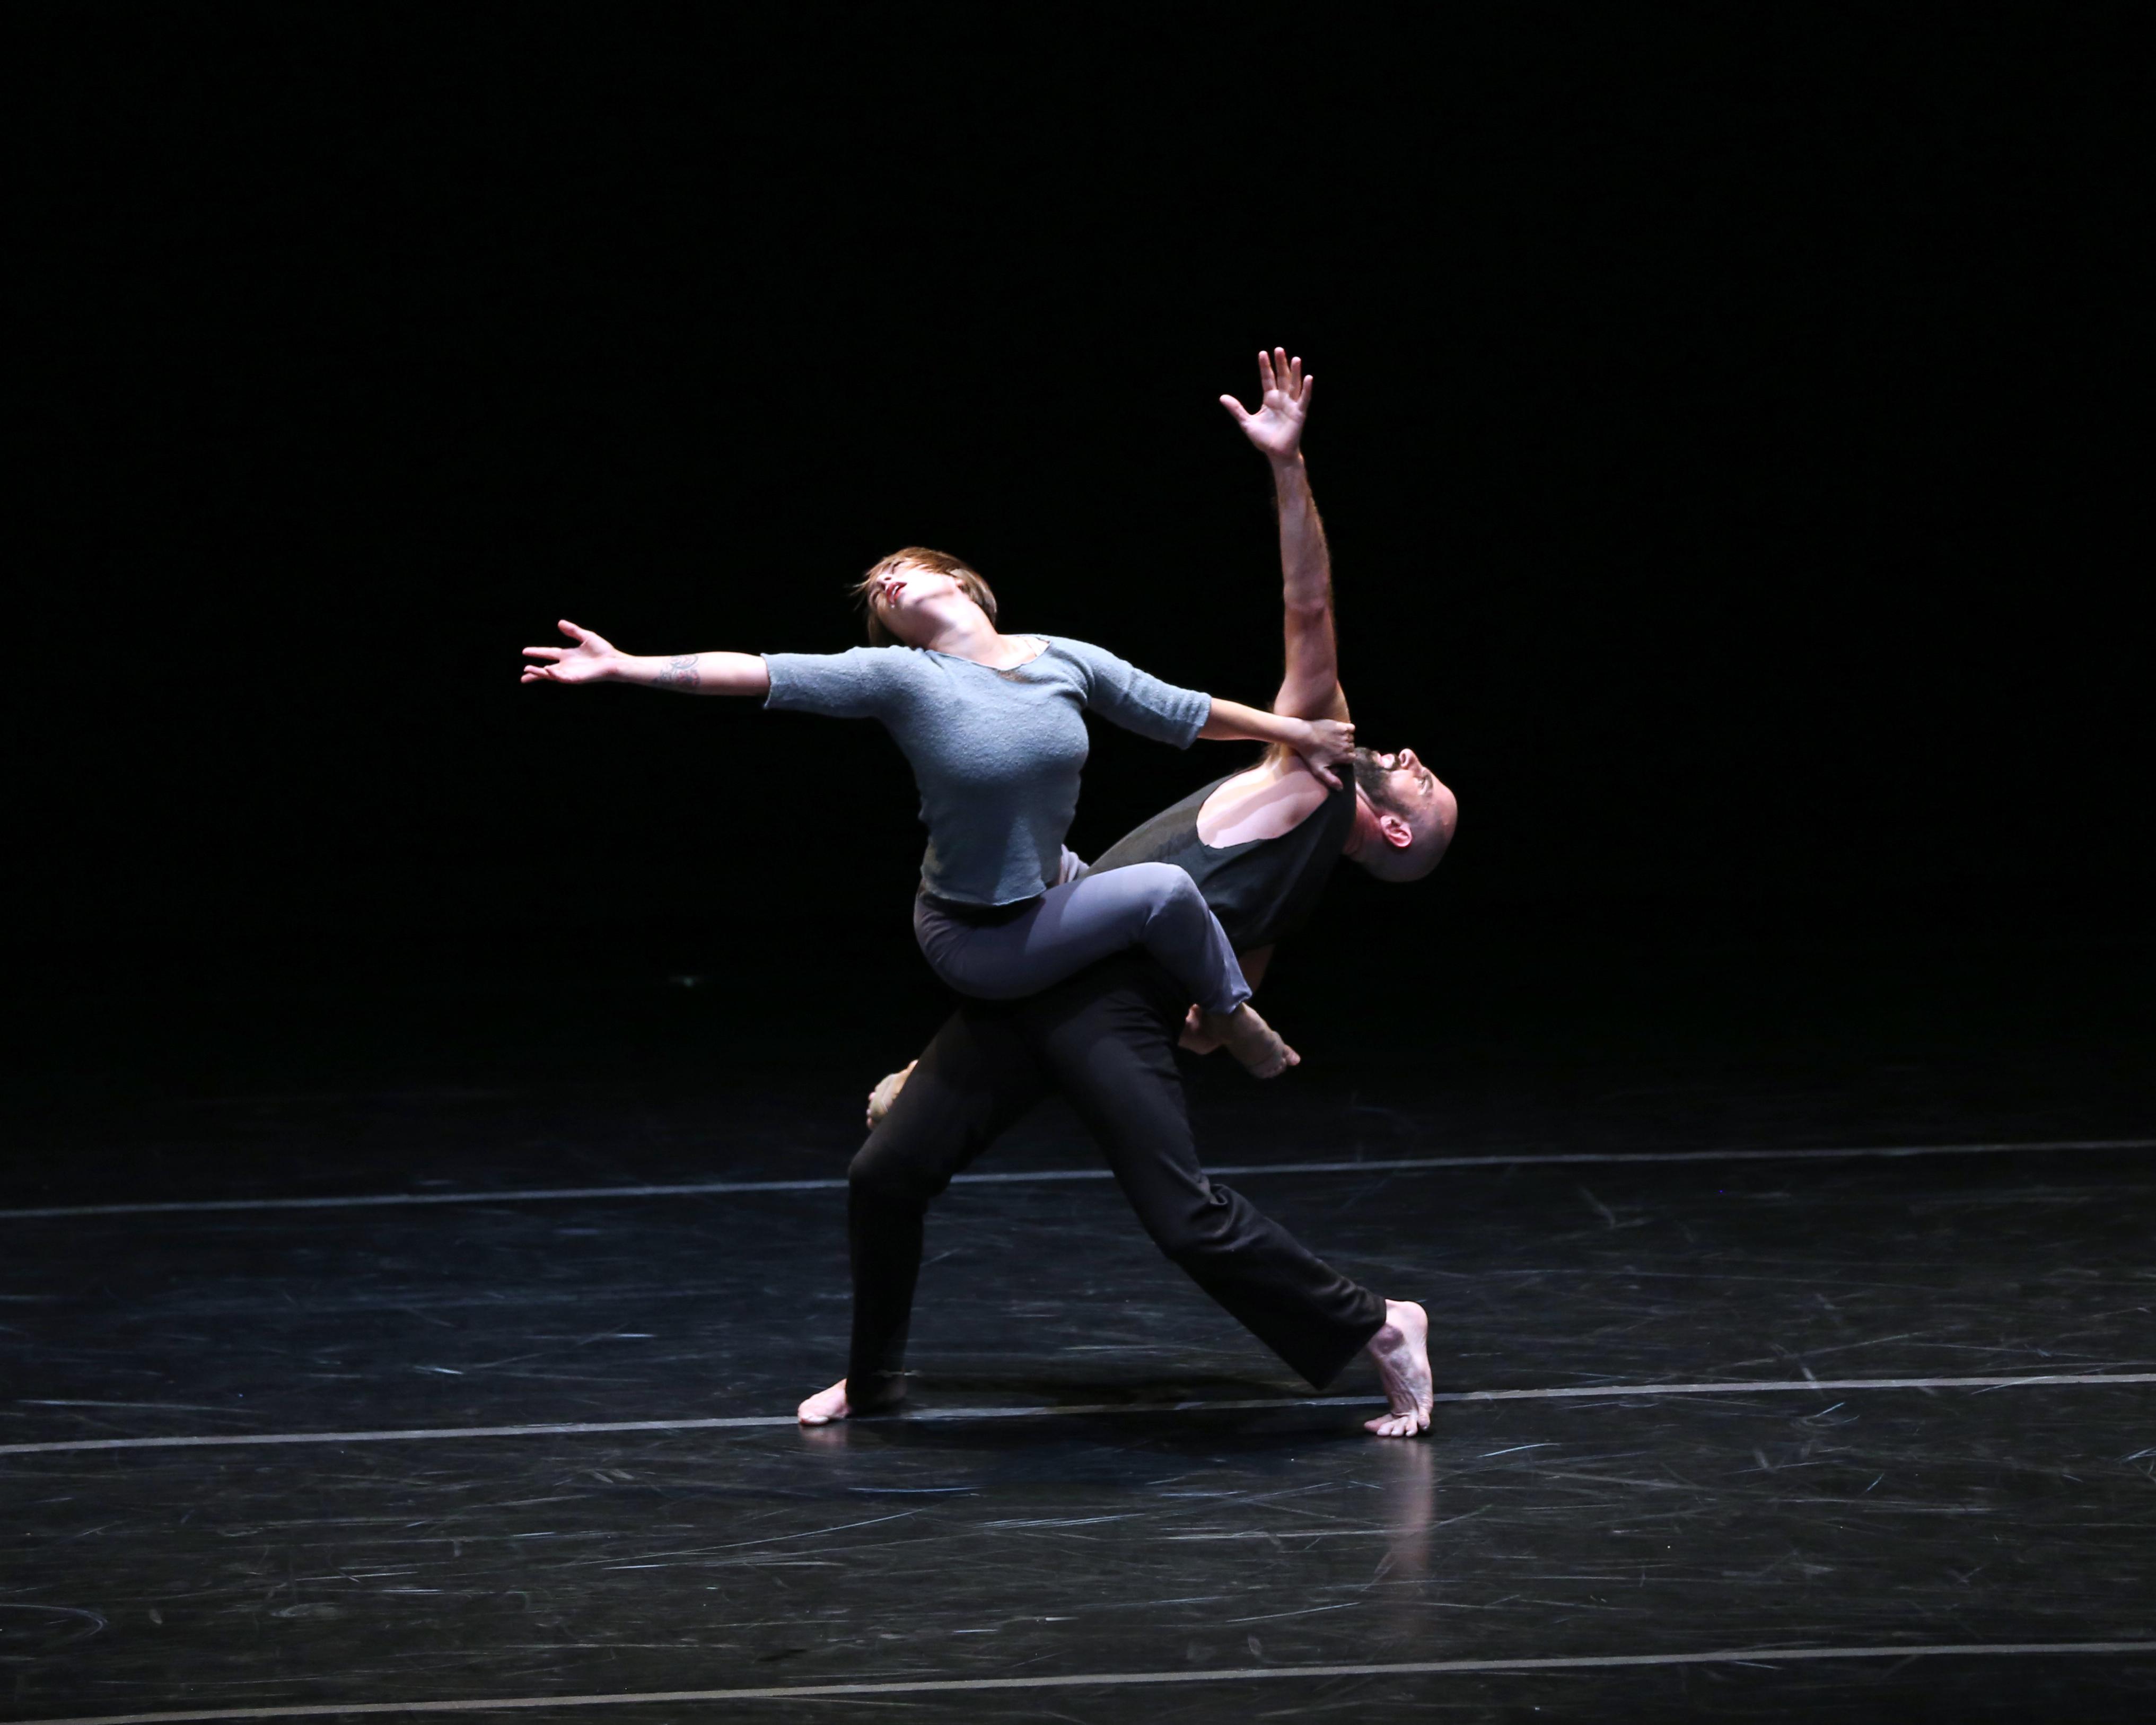 Crisis Variations, Photo by Bill Herbert. Dancers: Skarpetowska and McGinnis.